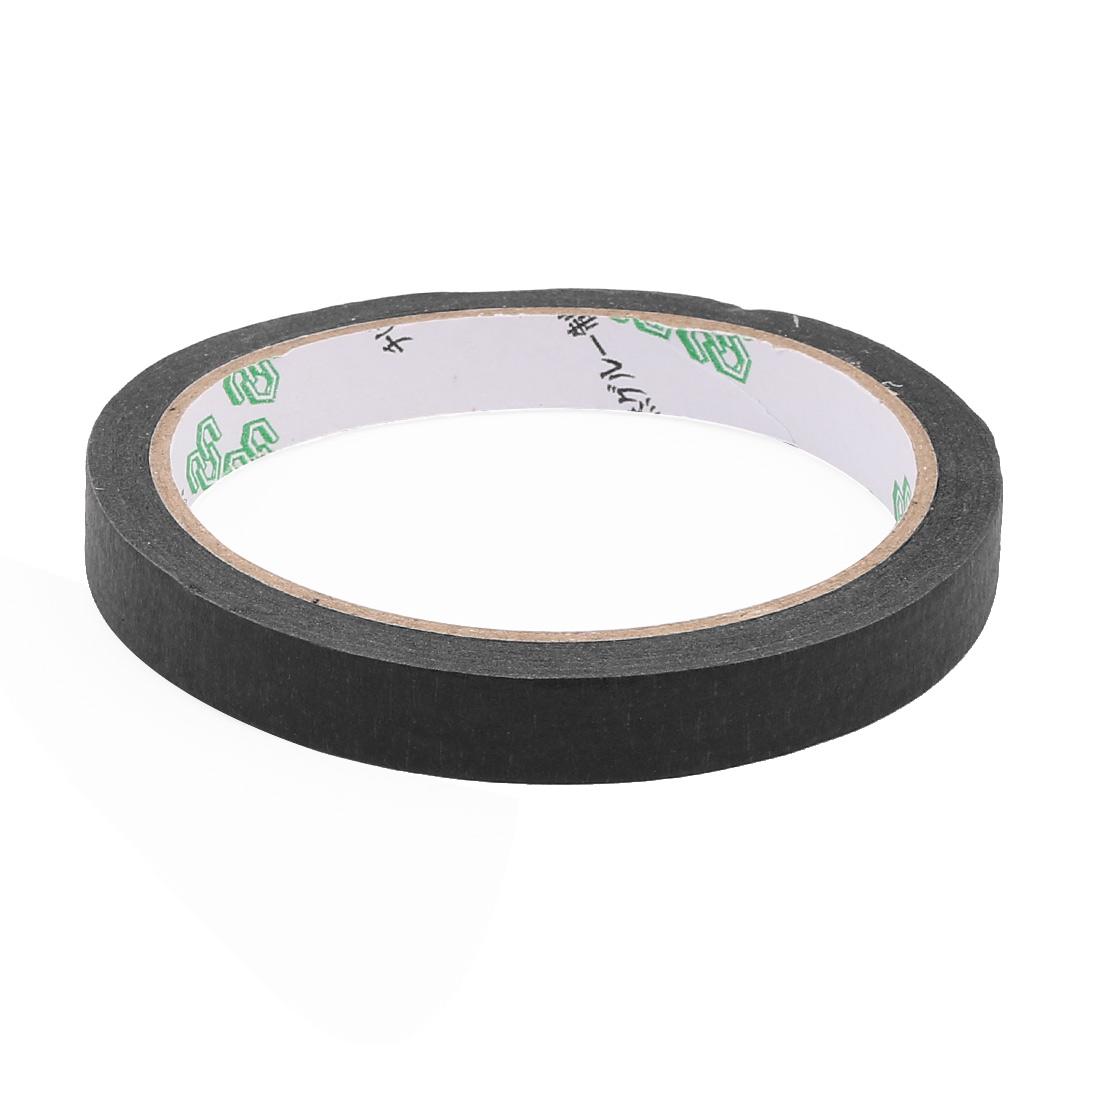 "Crepe Paper Black Easy Release Painters Masking Tape 22 yds Length x 0.5"" Width - image 2 de 3"